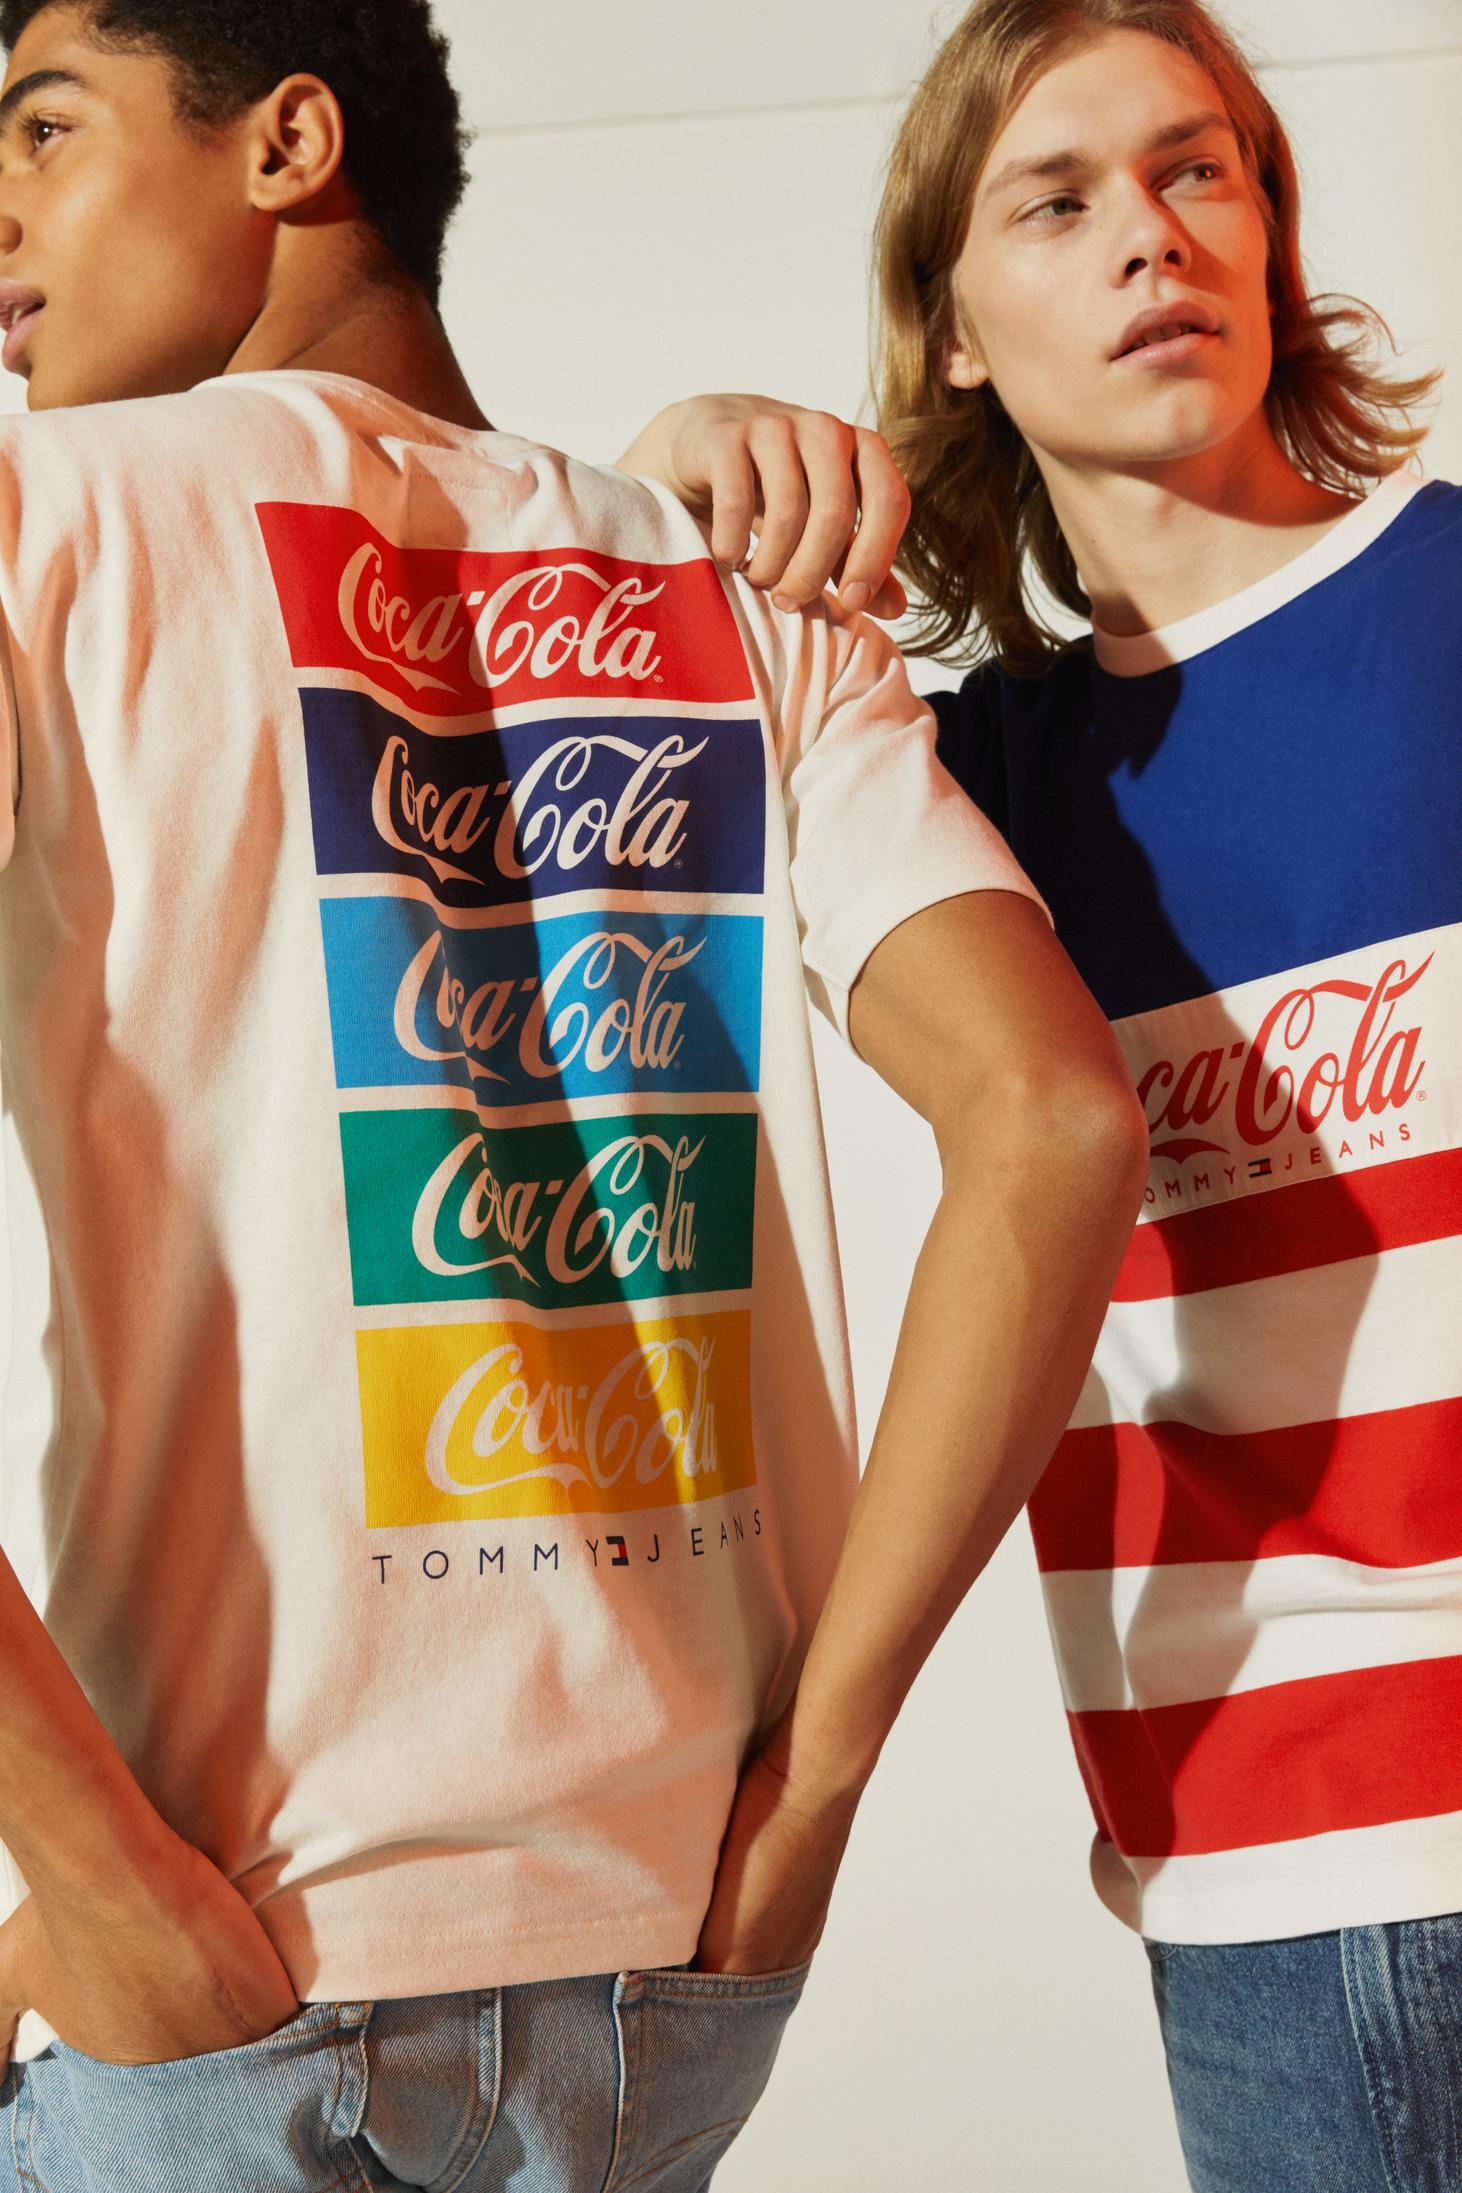 Tommy Hilfiger e Coca-cola